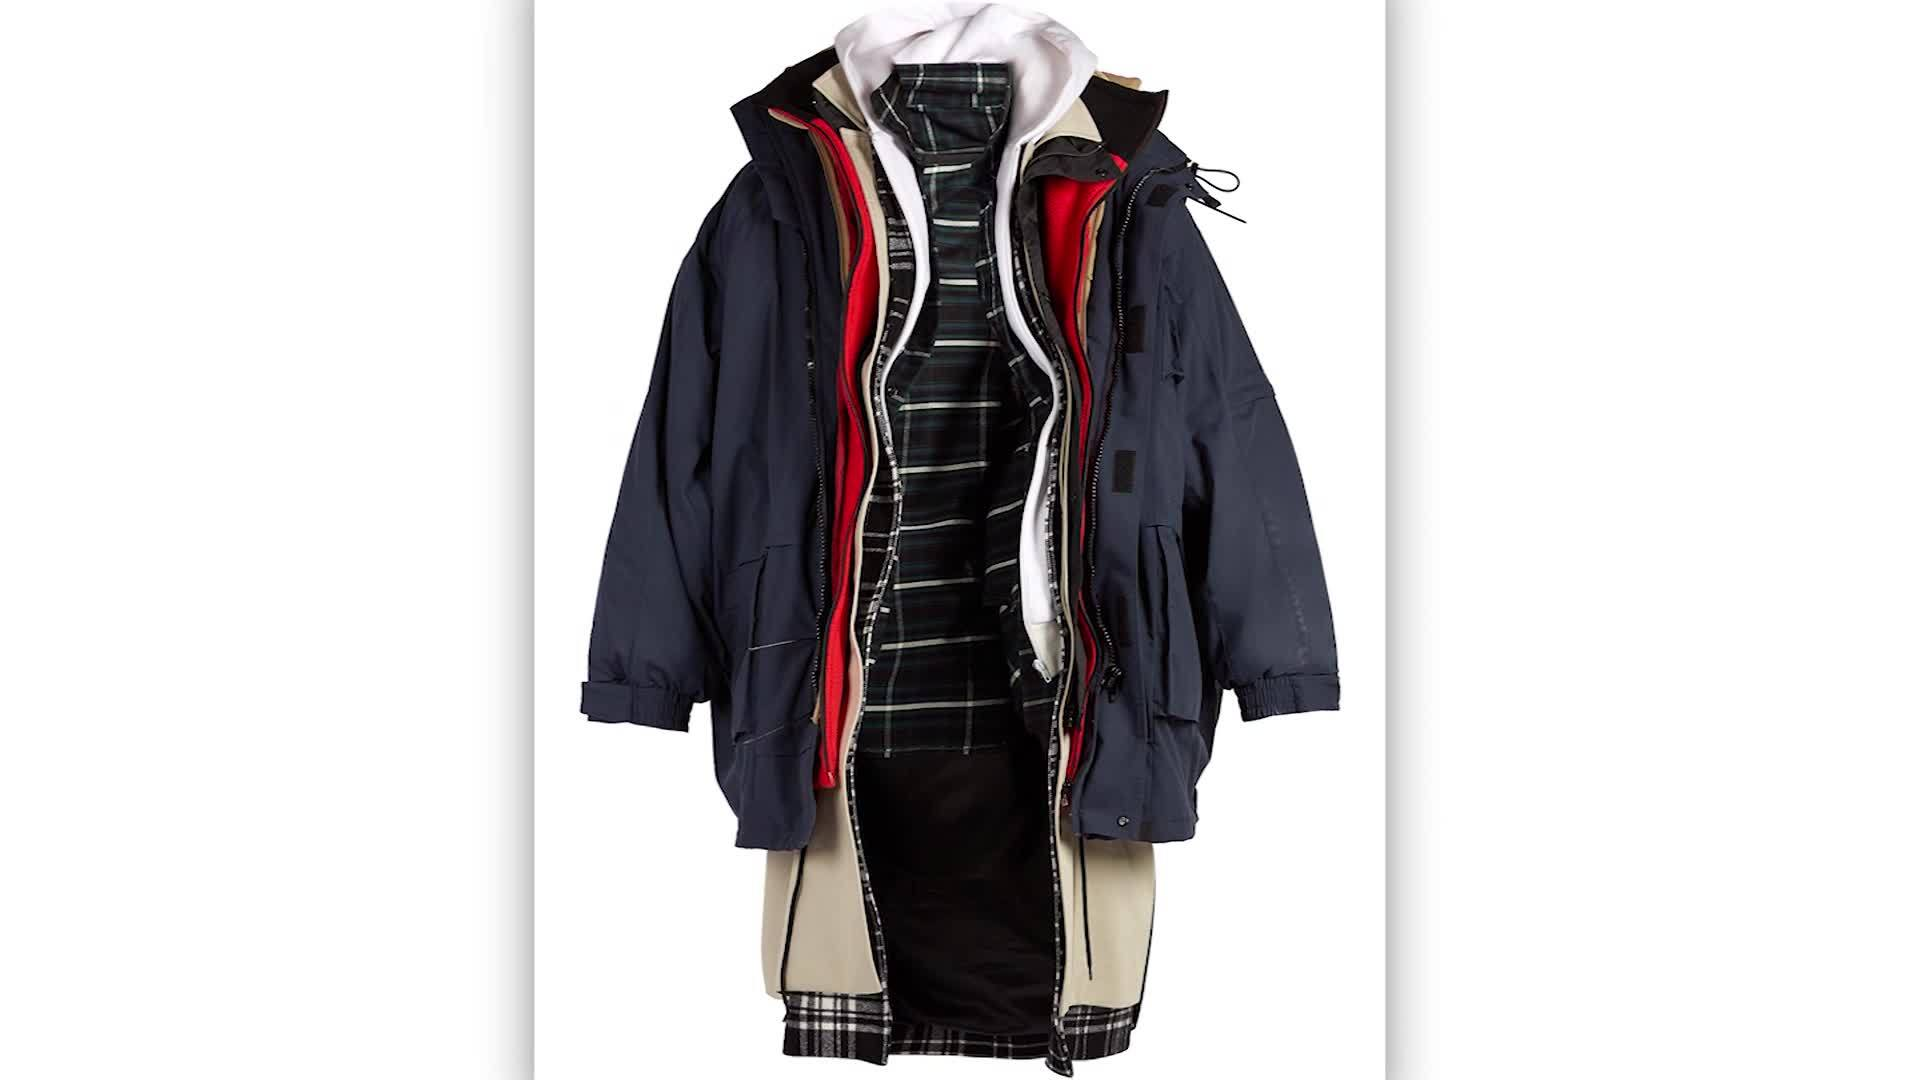 7a006c654 Balenciaga selling 7-layer jacket for $9,000